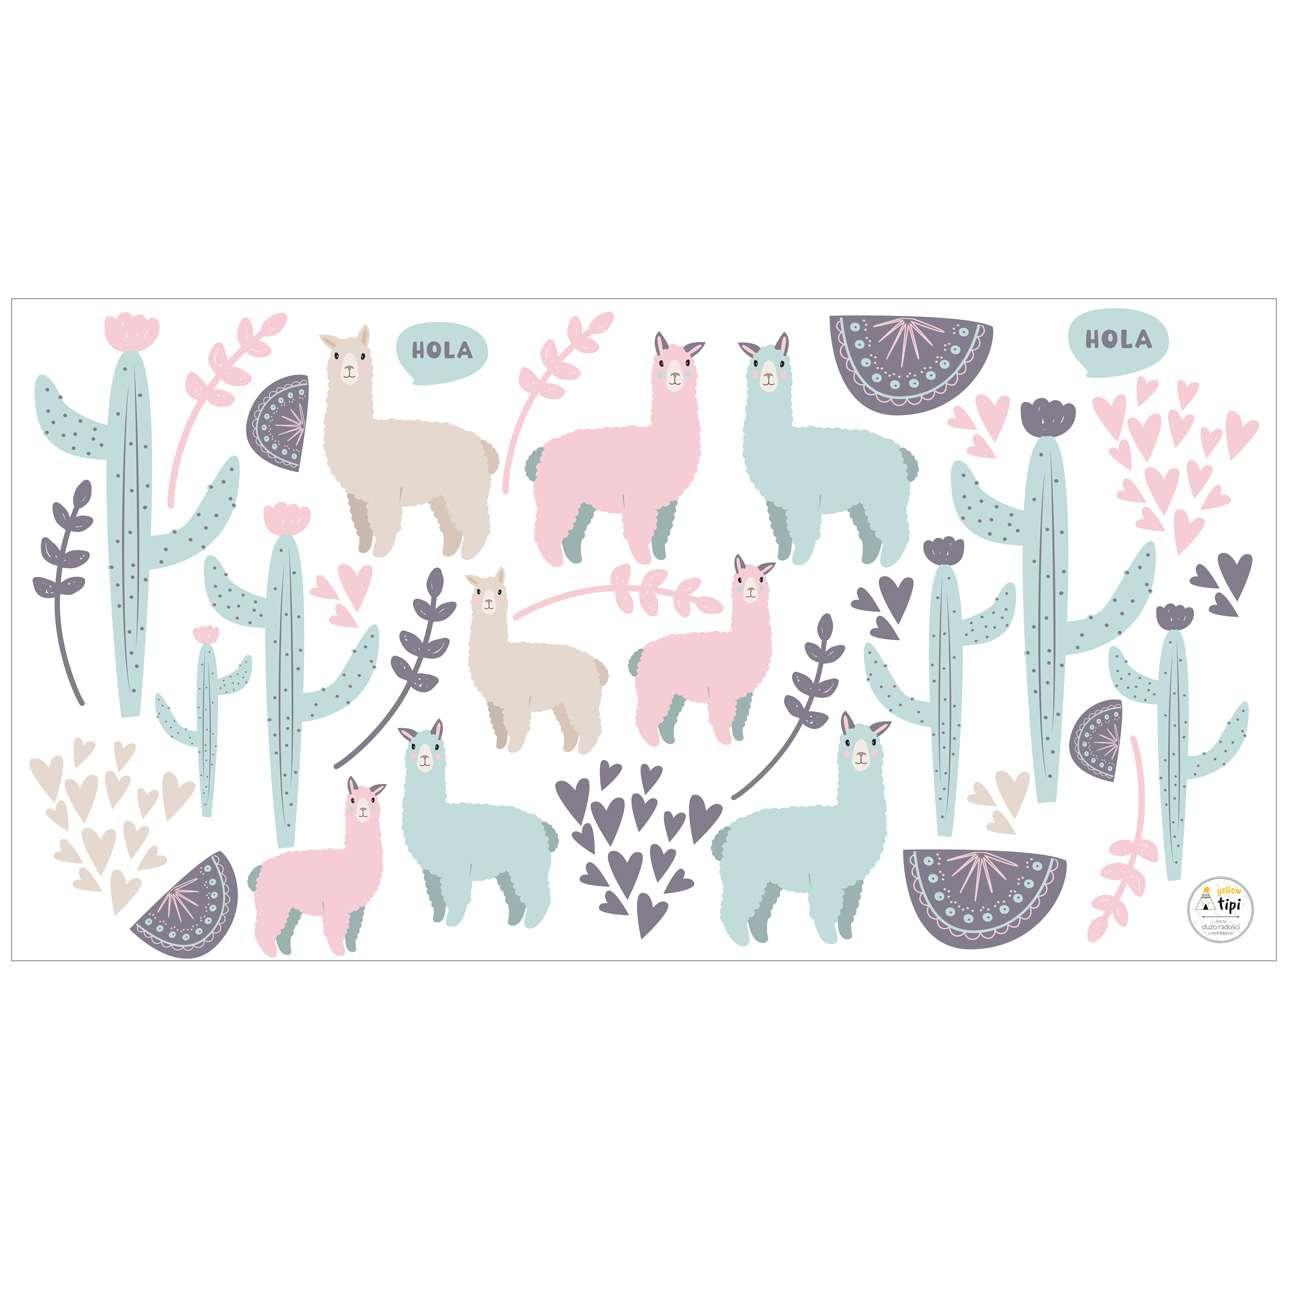 Sweet Llama sticker set